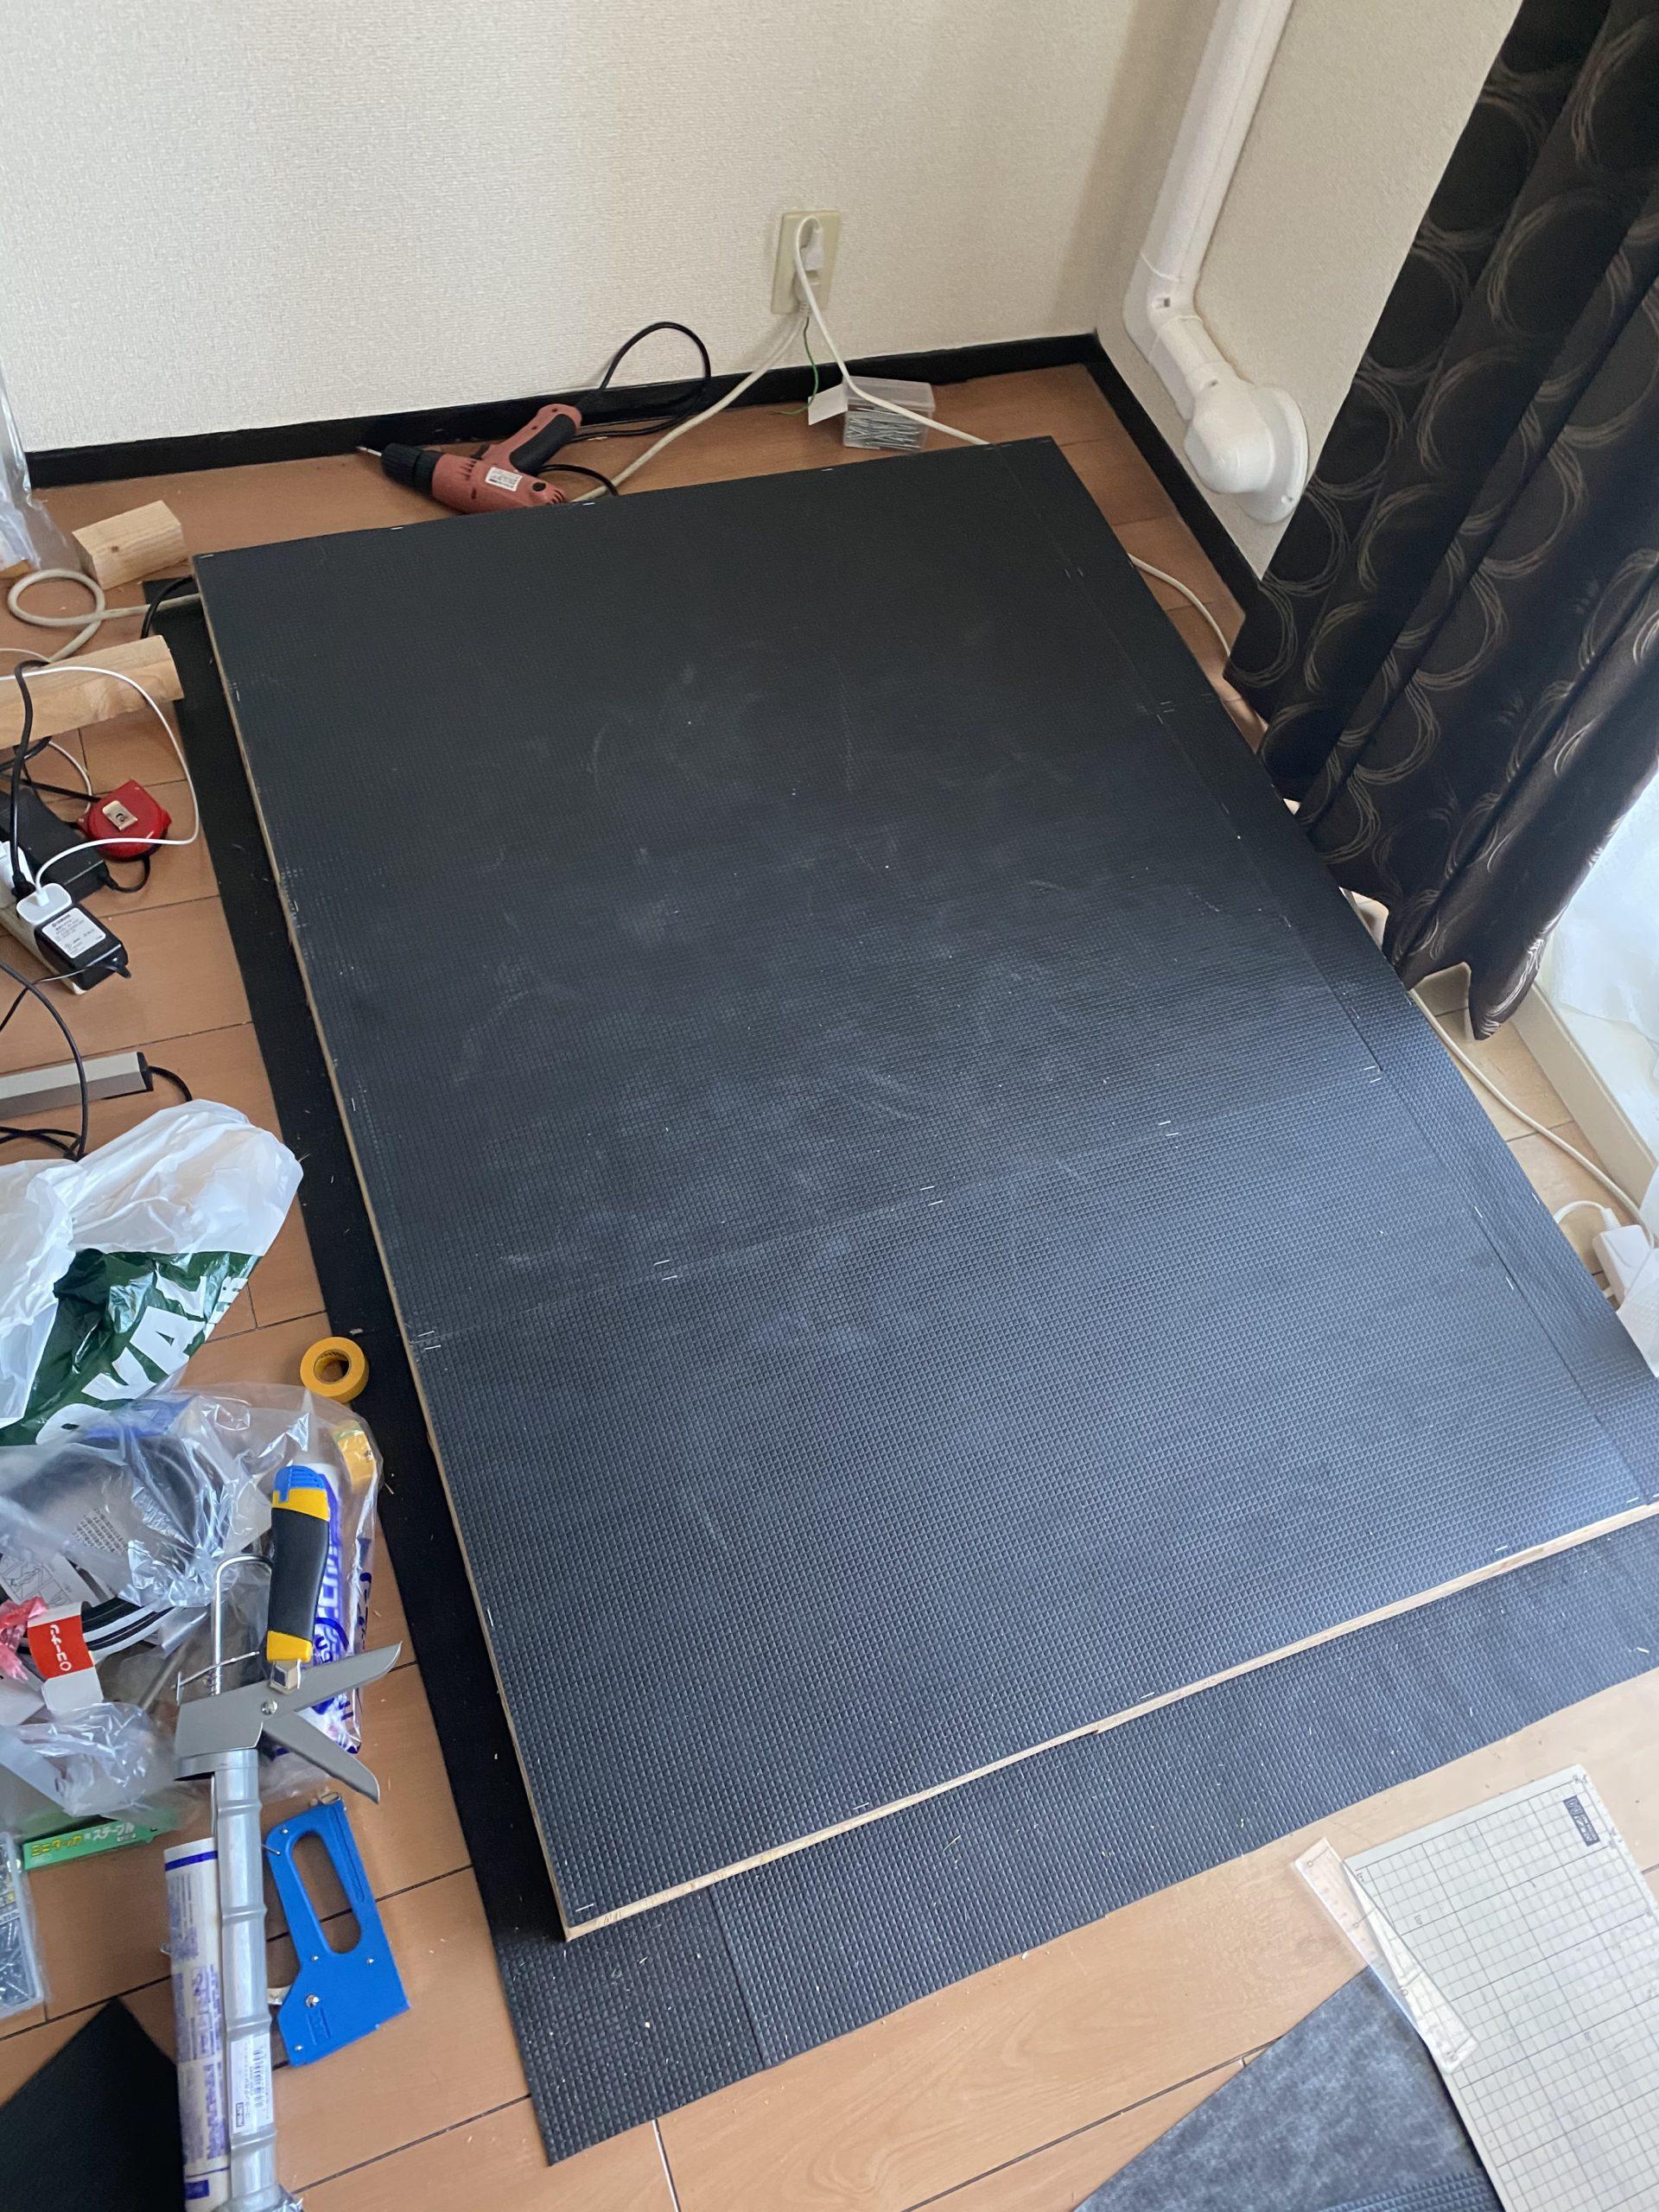 【DIYで防音室自作!】床制作編。レコーディング用、練習用のボーカルブースを自作!賃貸マンションに録音環境を!